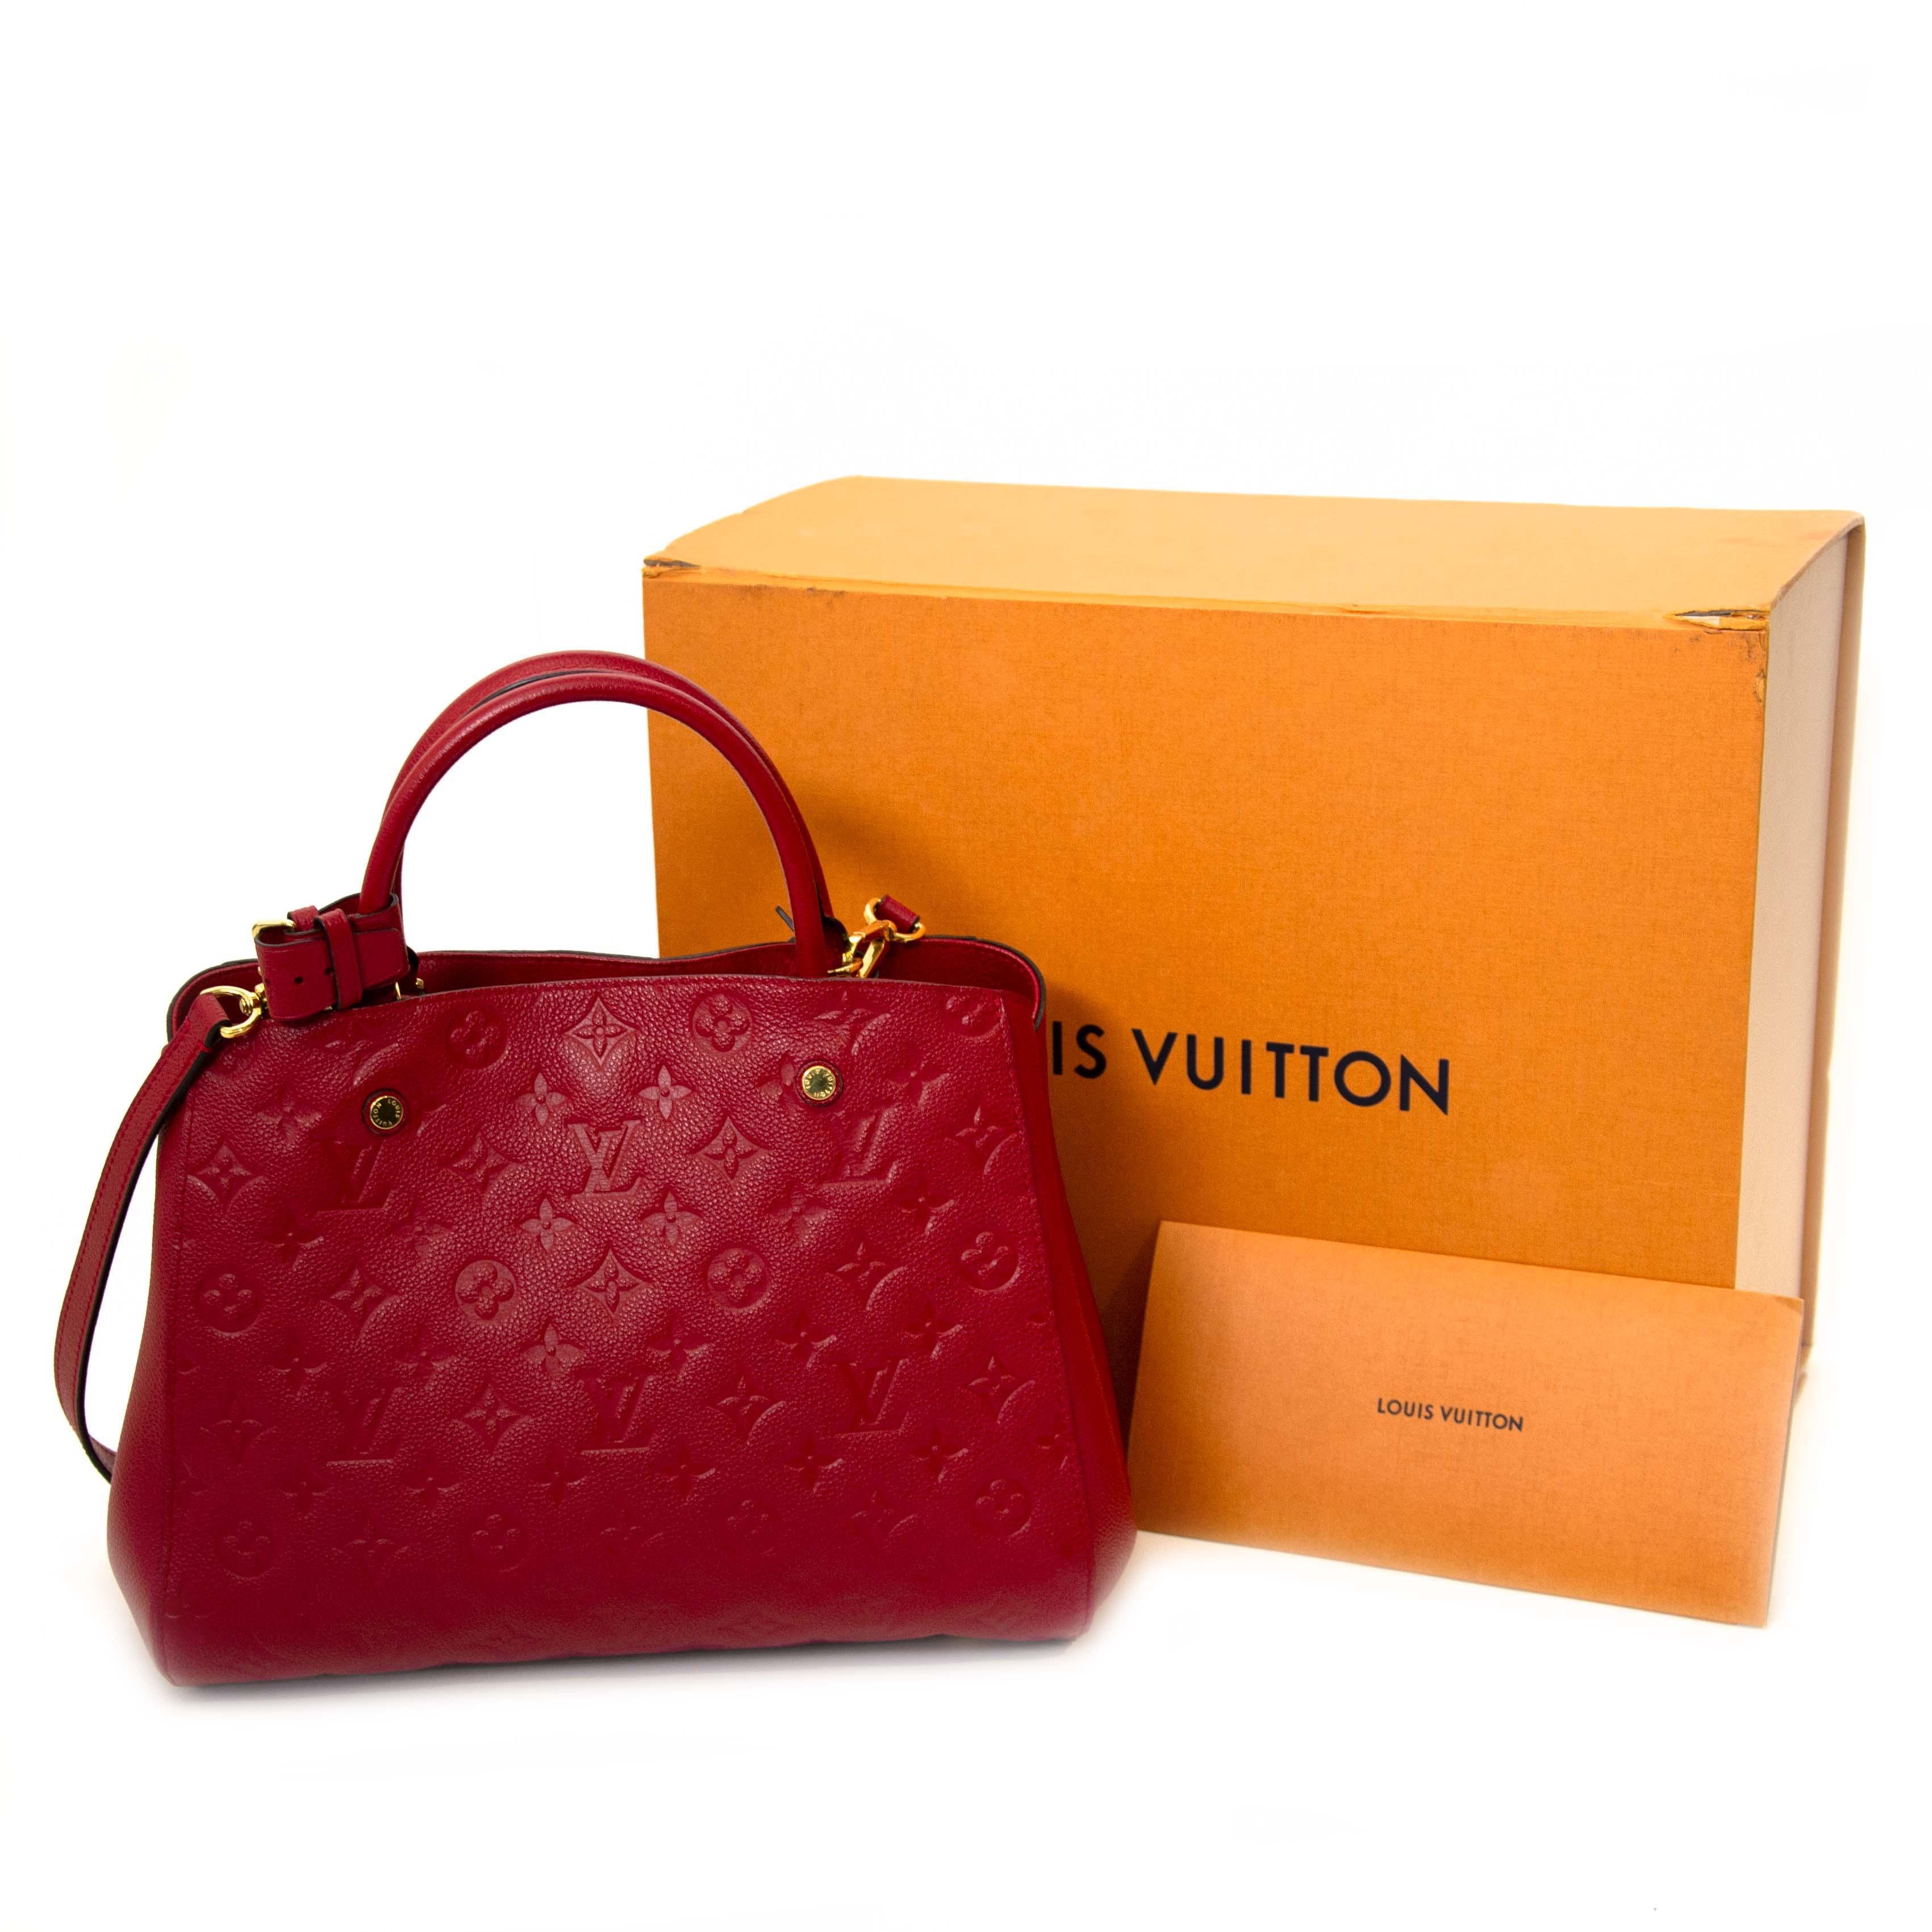 Louis Vuitton Red Montaigne MM Monogram Empreinte Top Handle Bag